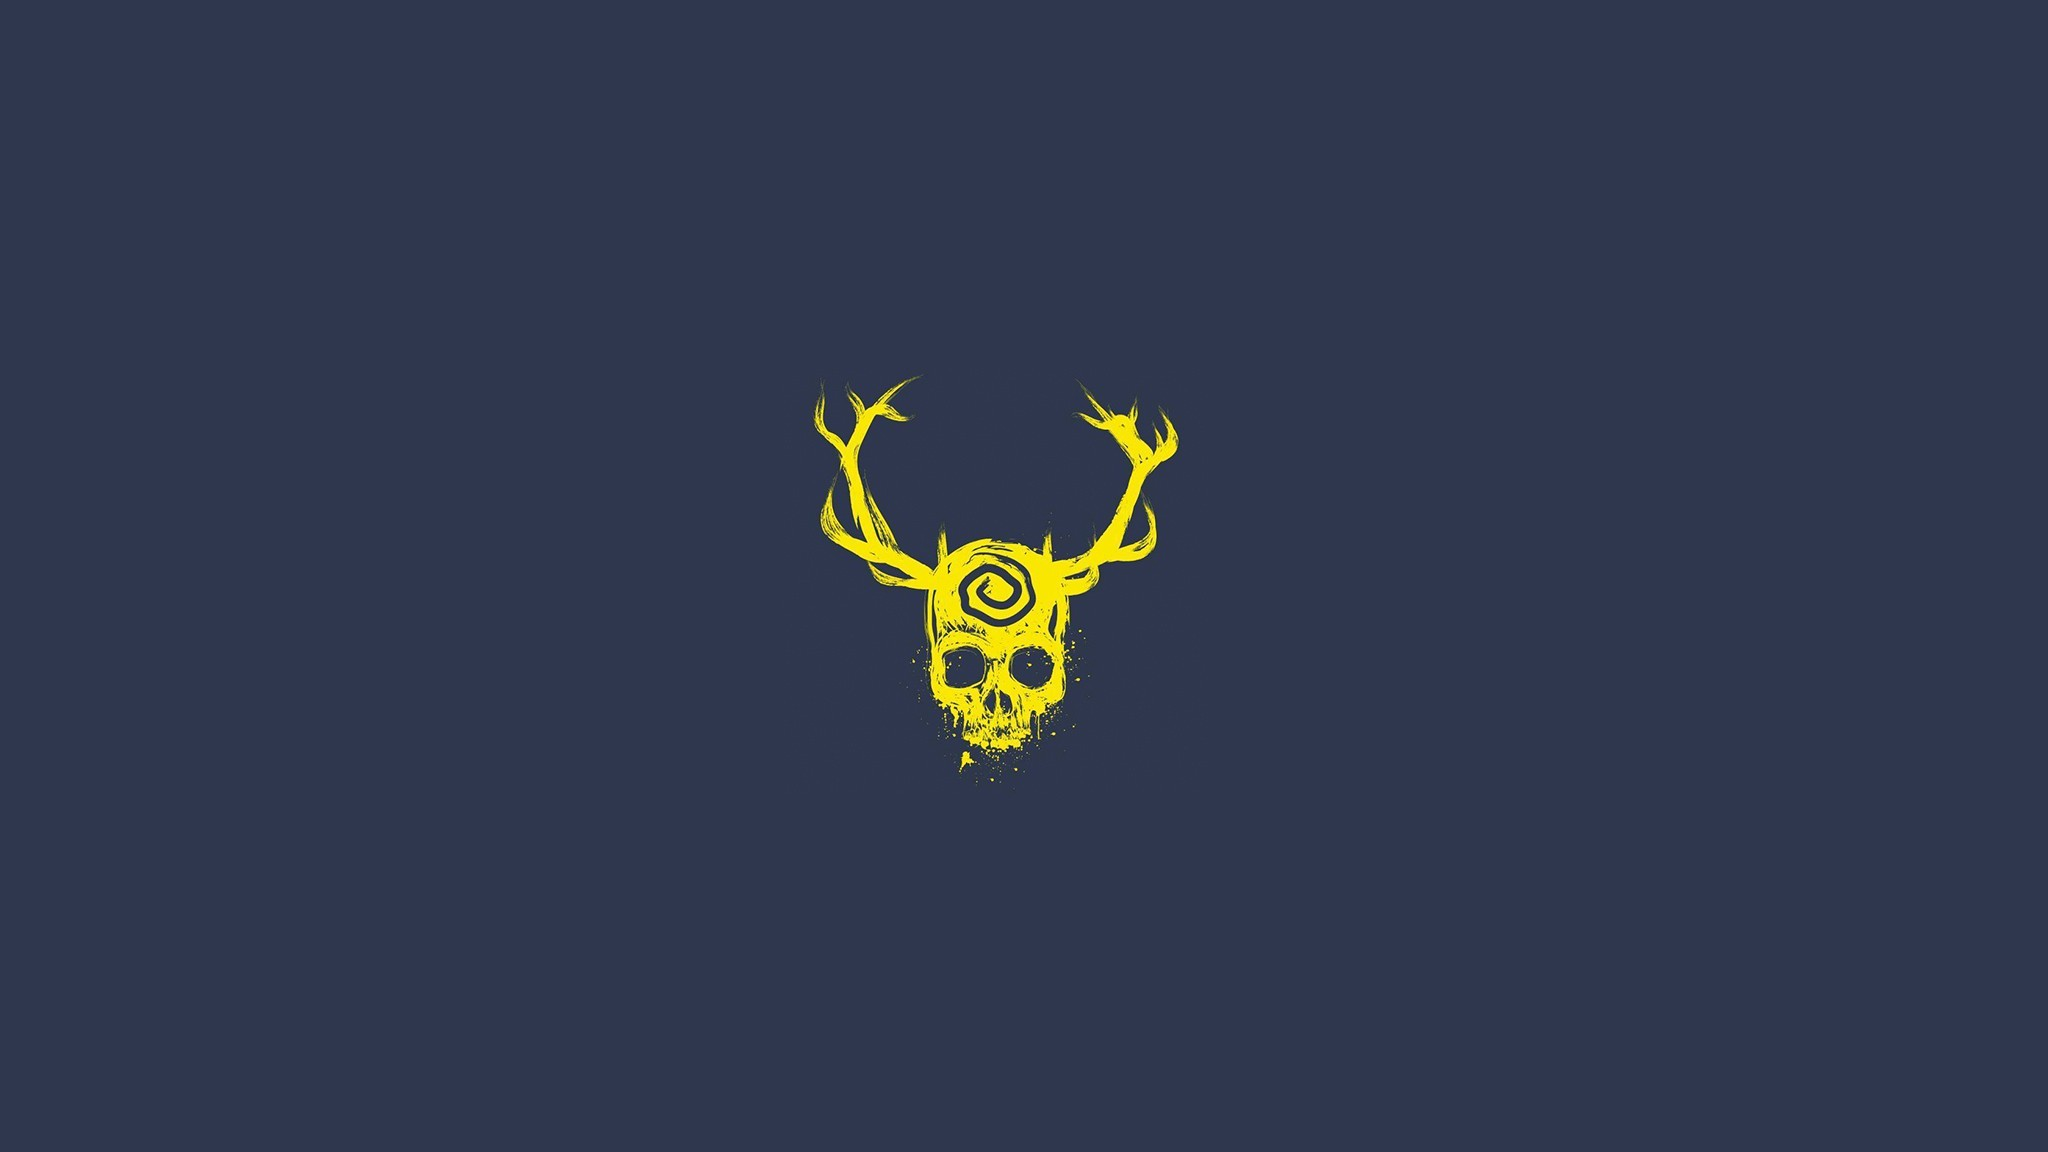 Download Skull Minimalist HD 4k Wallpapers In 1080×1920 .